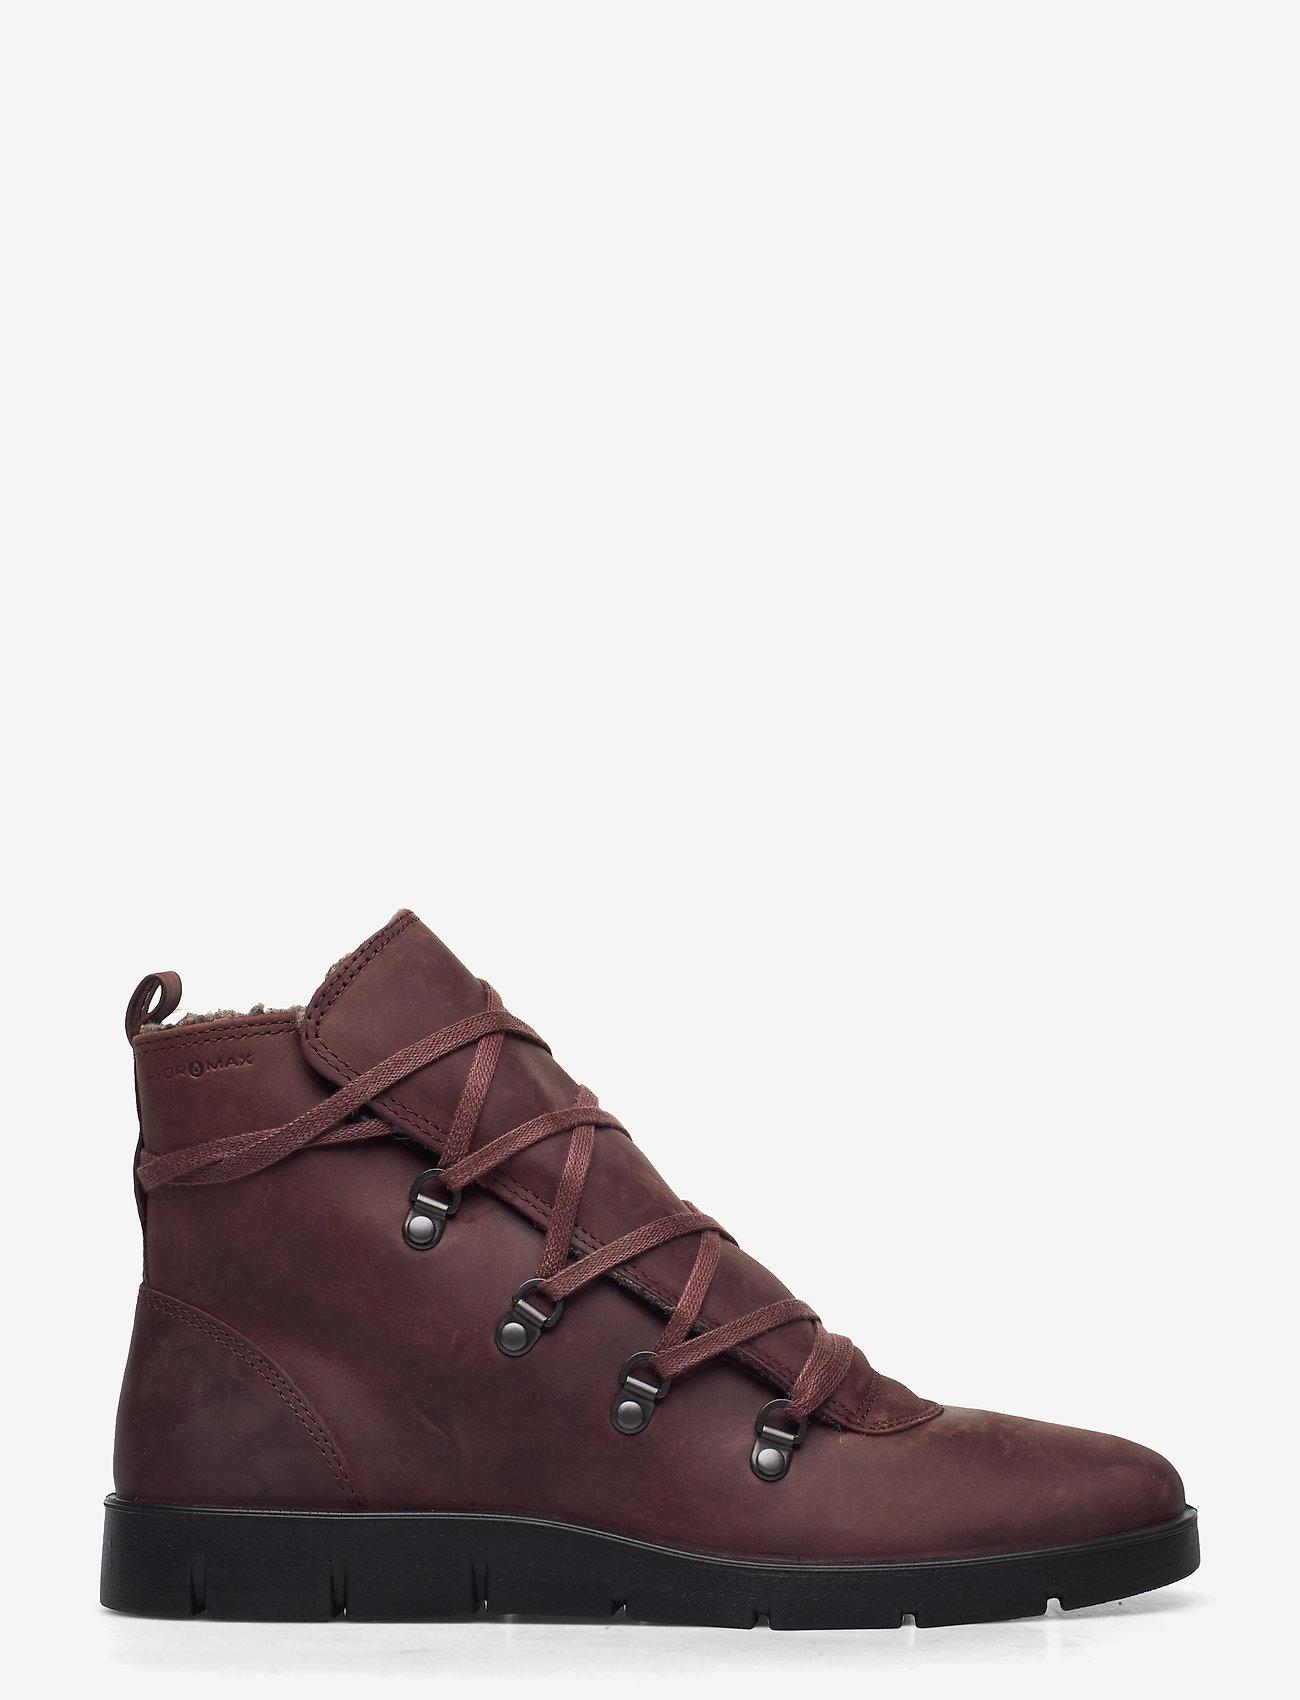 ECCO - BELLA - flat ankle boots - chocolat - 1